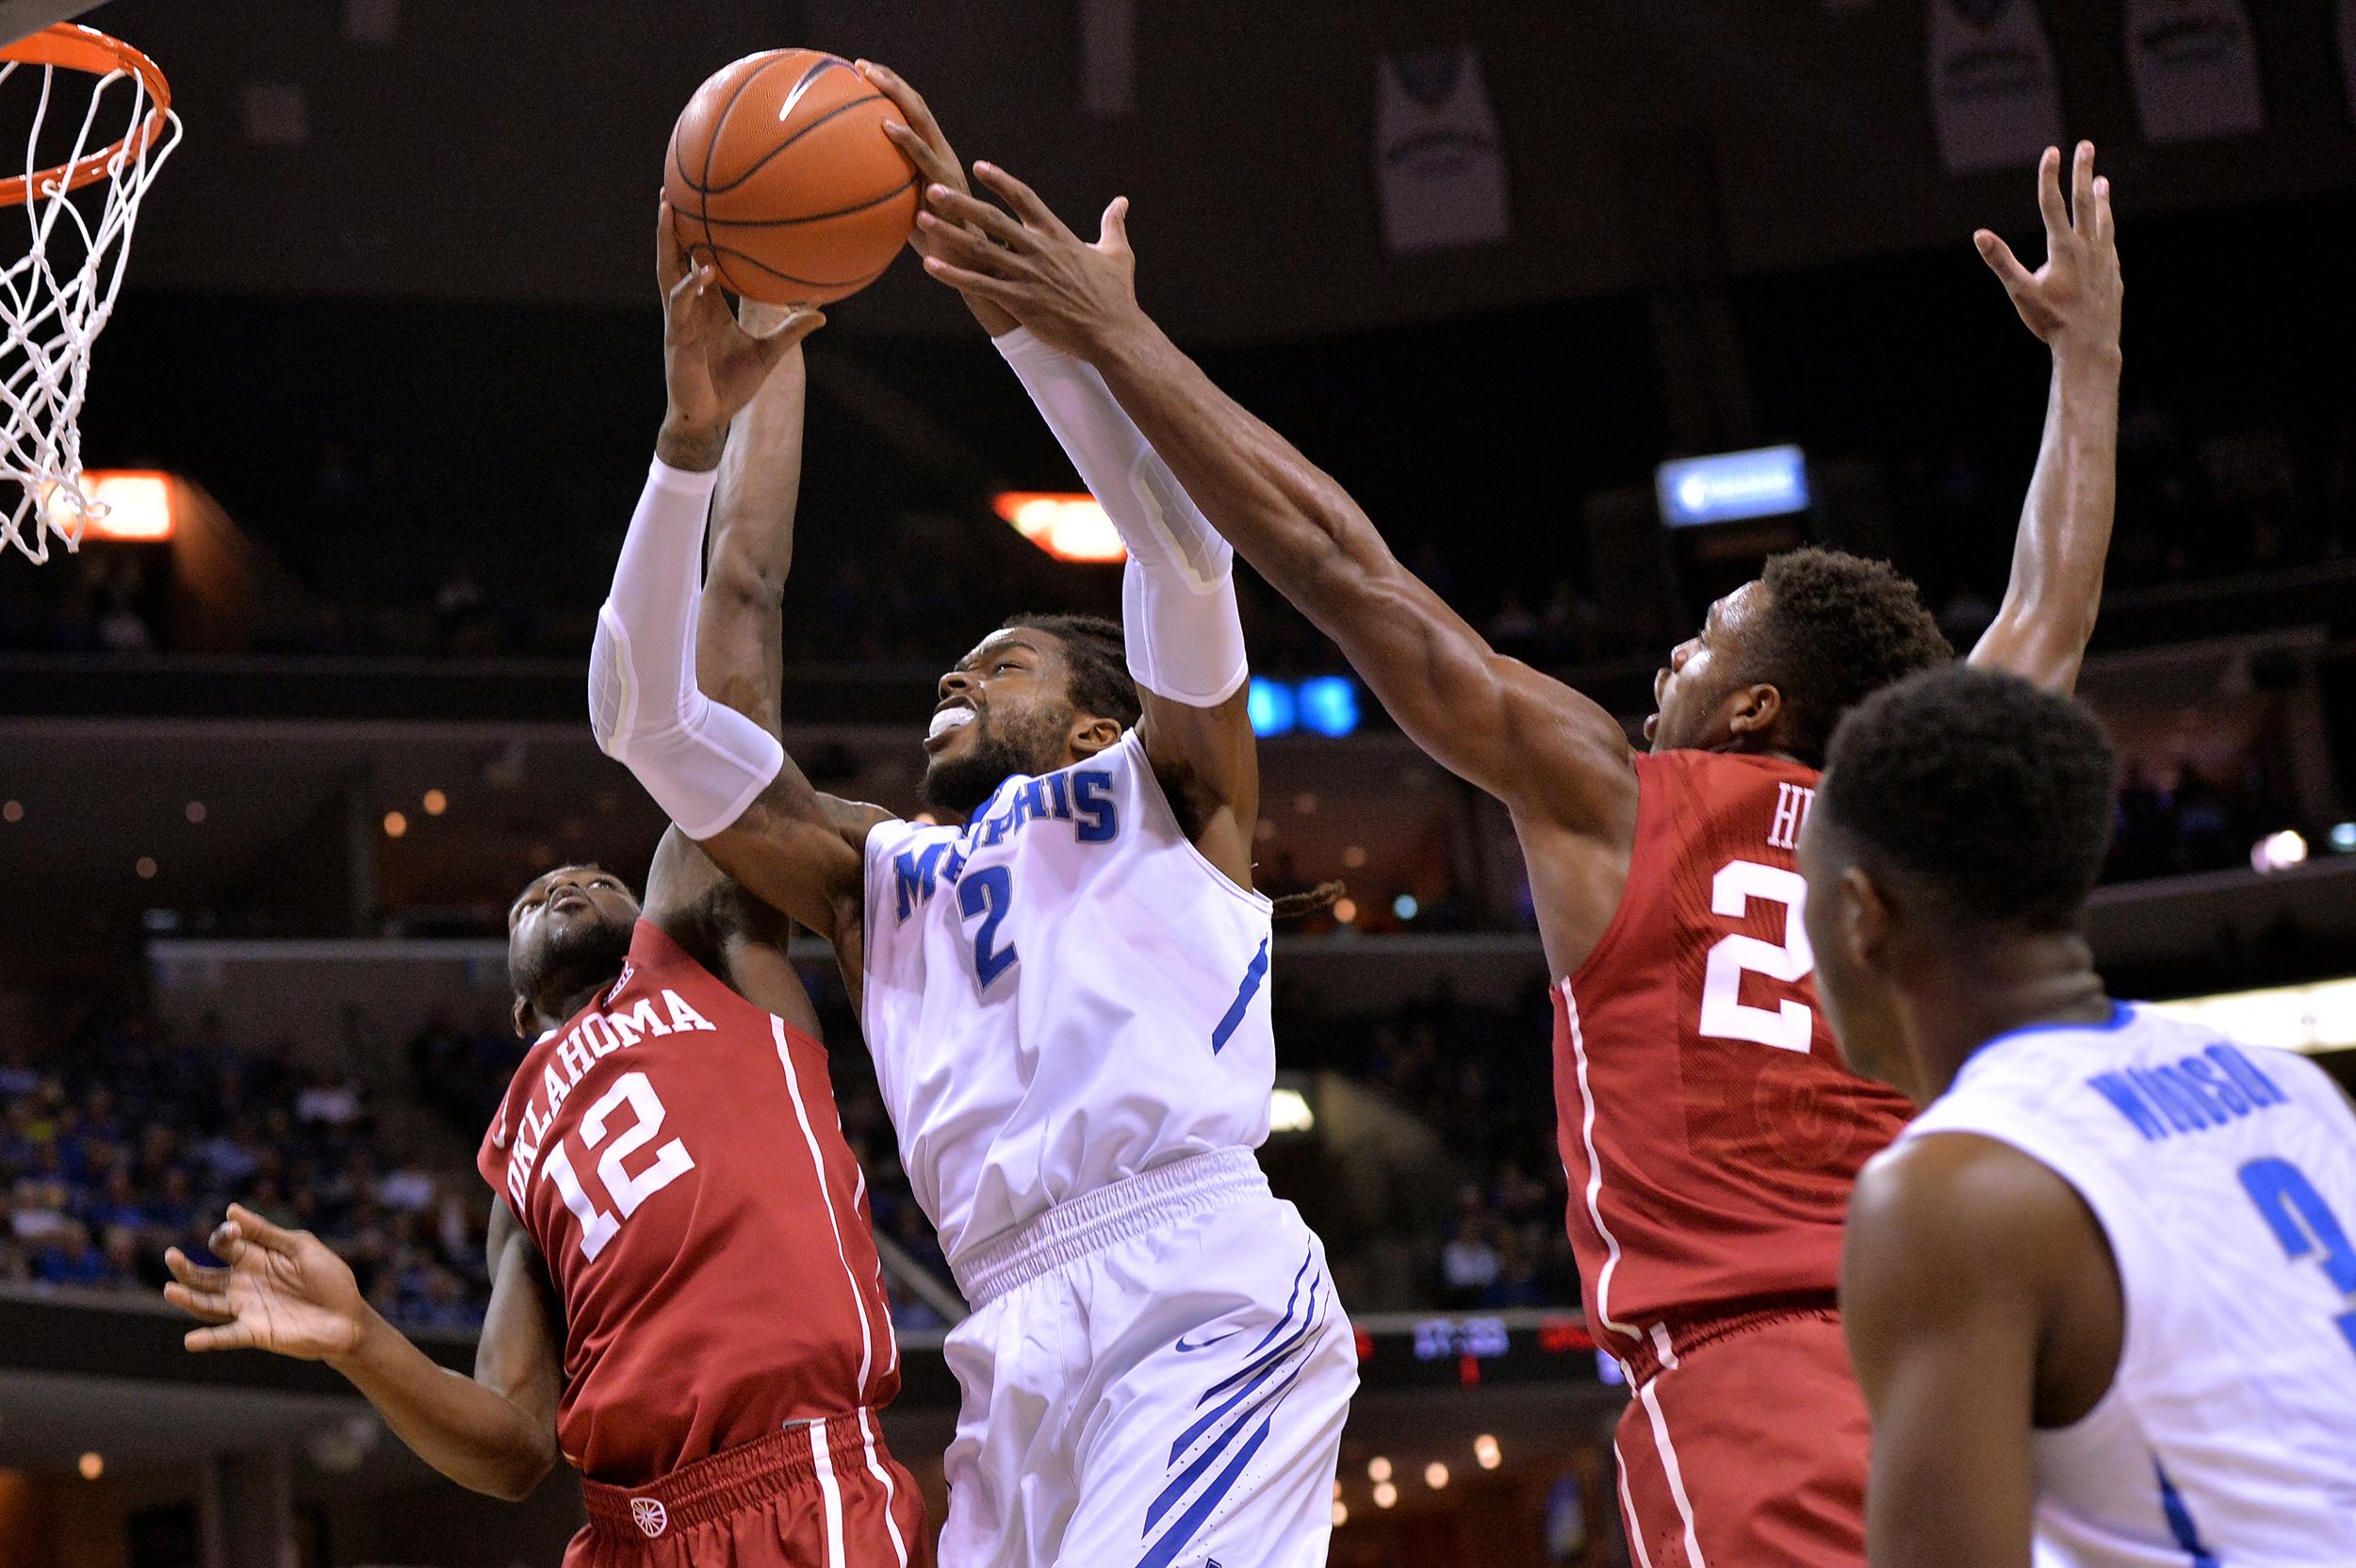 Memphis forward Shaq Goodwin (2) shoots between Oklahoma forward Khadeem Lattin (12) and guard Buddy Hield, right, in the first half of an NCAA college basketball game, Tuesday, Nov. 17, 2015, in Memphis, Tenn. (AP Photo/Brandon Dill)